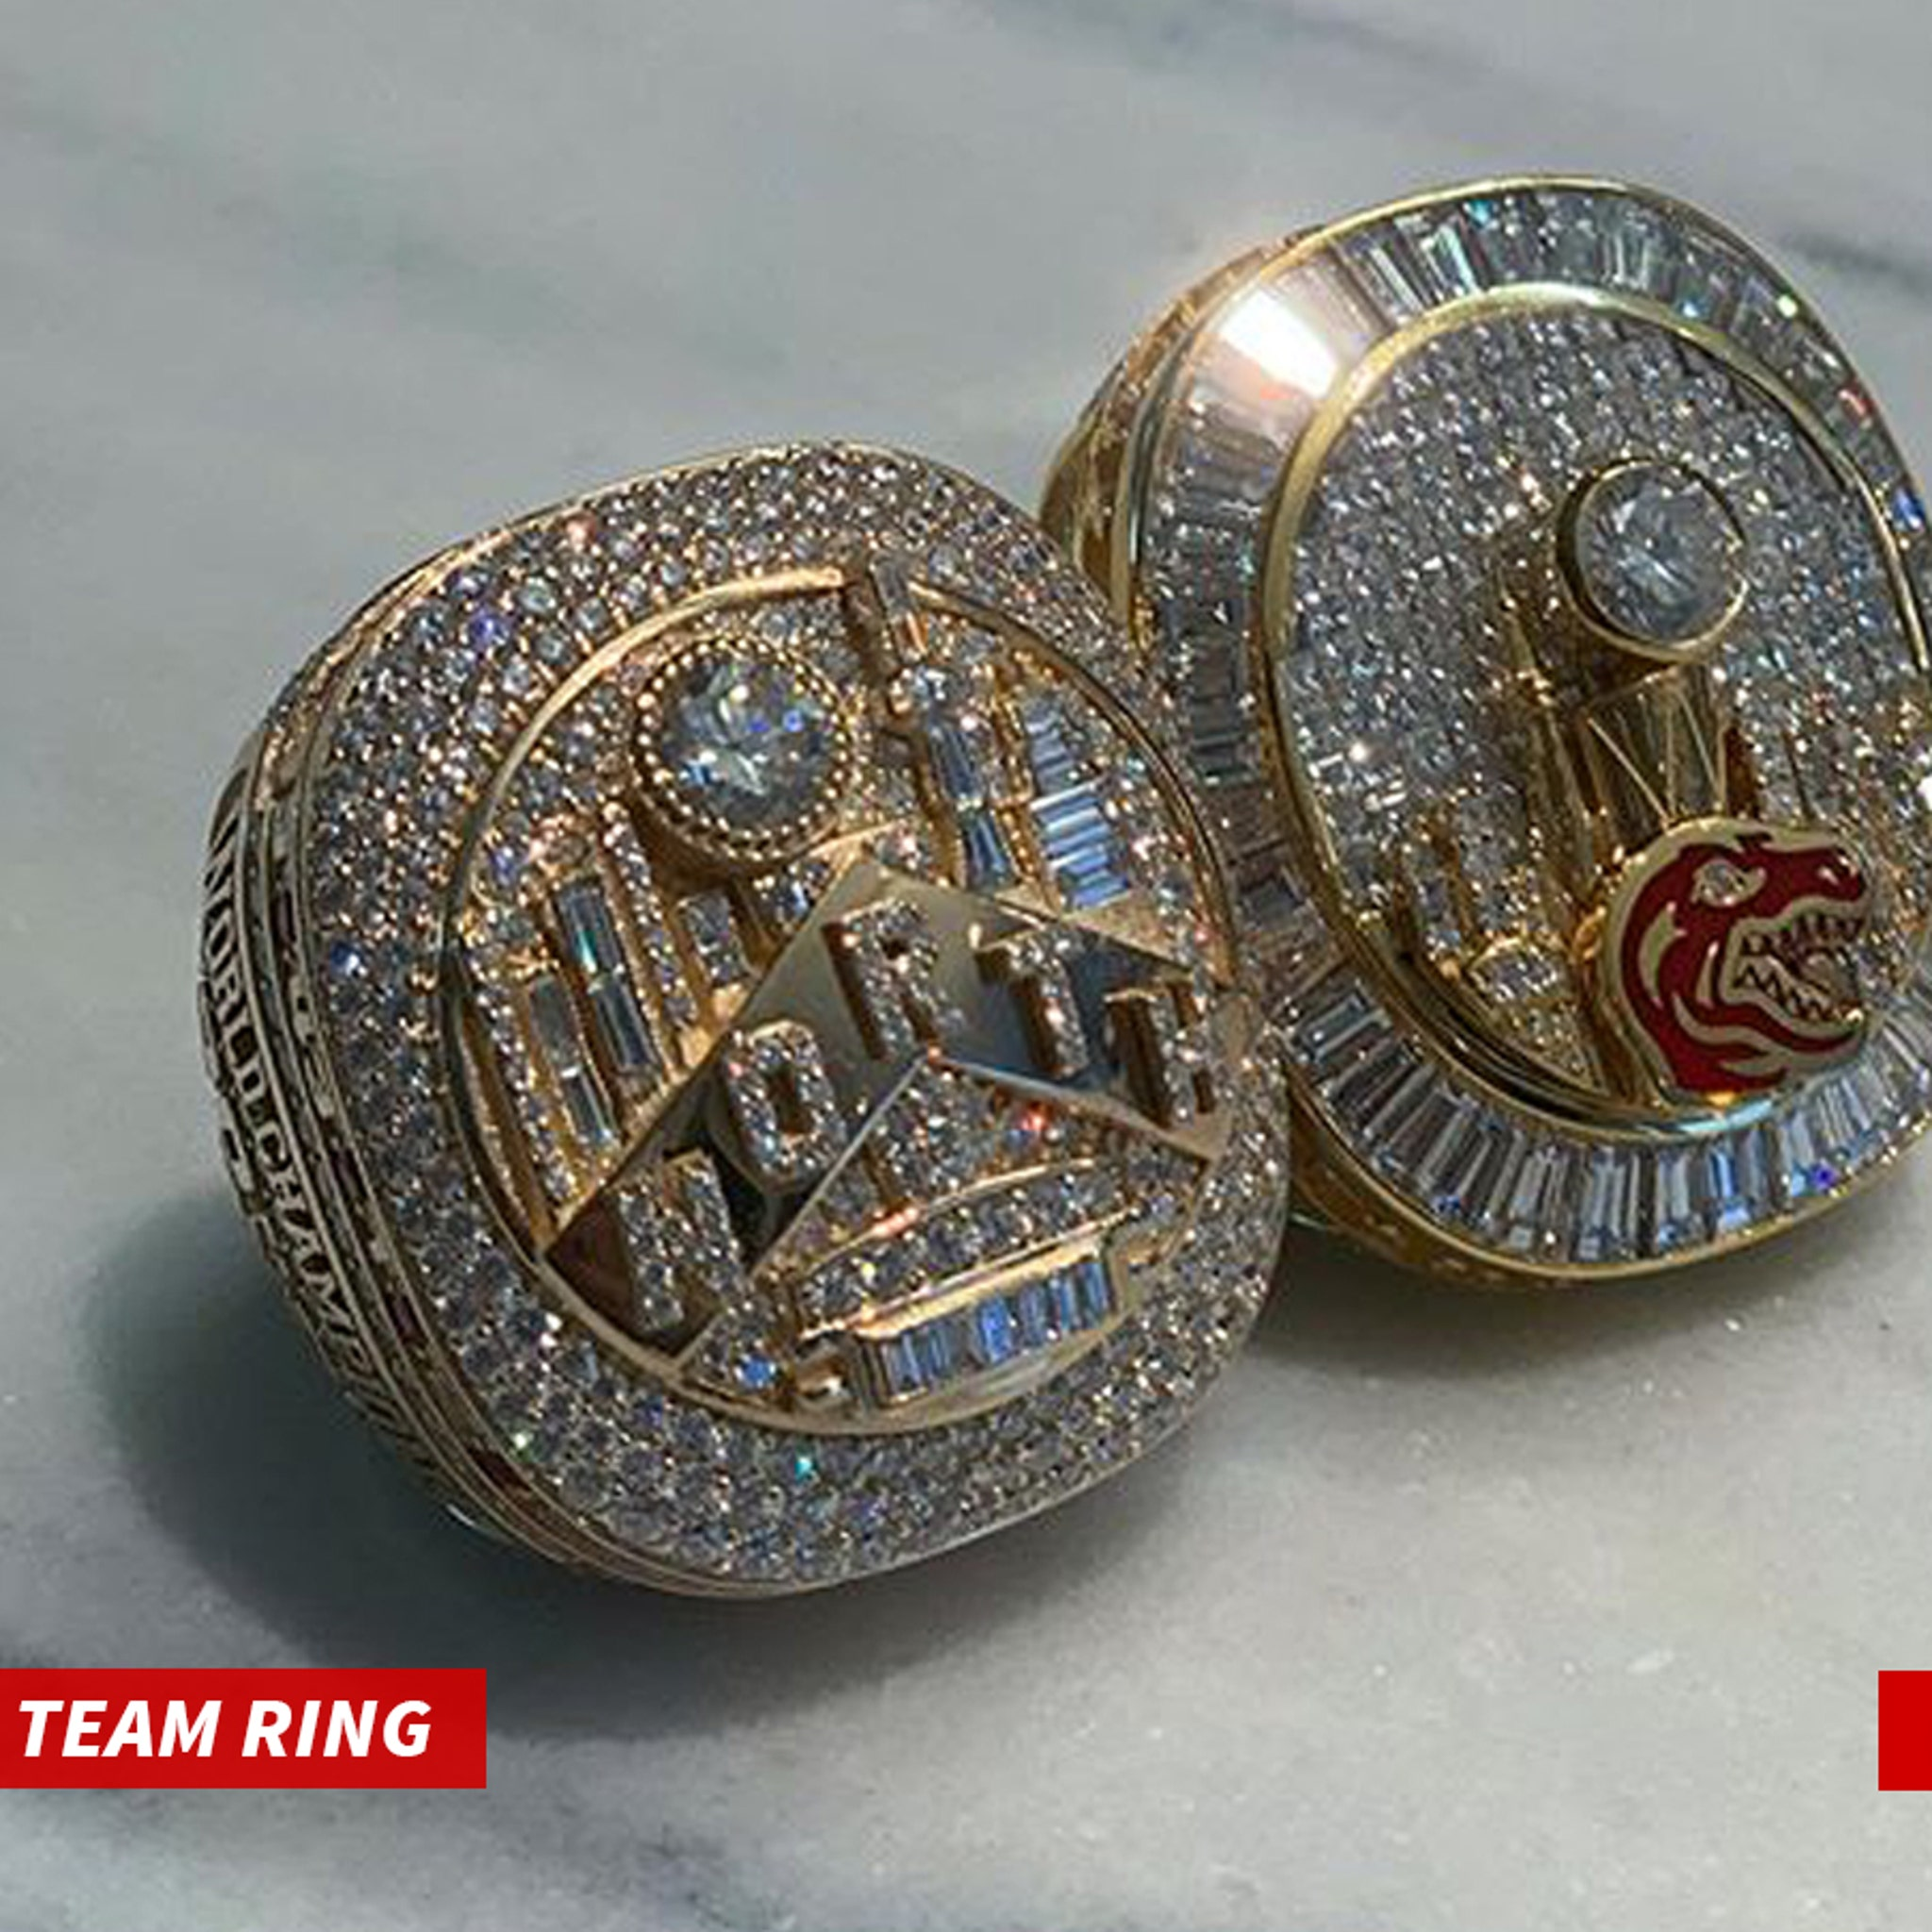 Drake Receives Raptors Championship Ring Gets 2nd Custom Ring For Himself